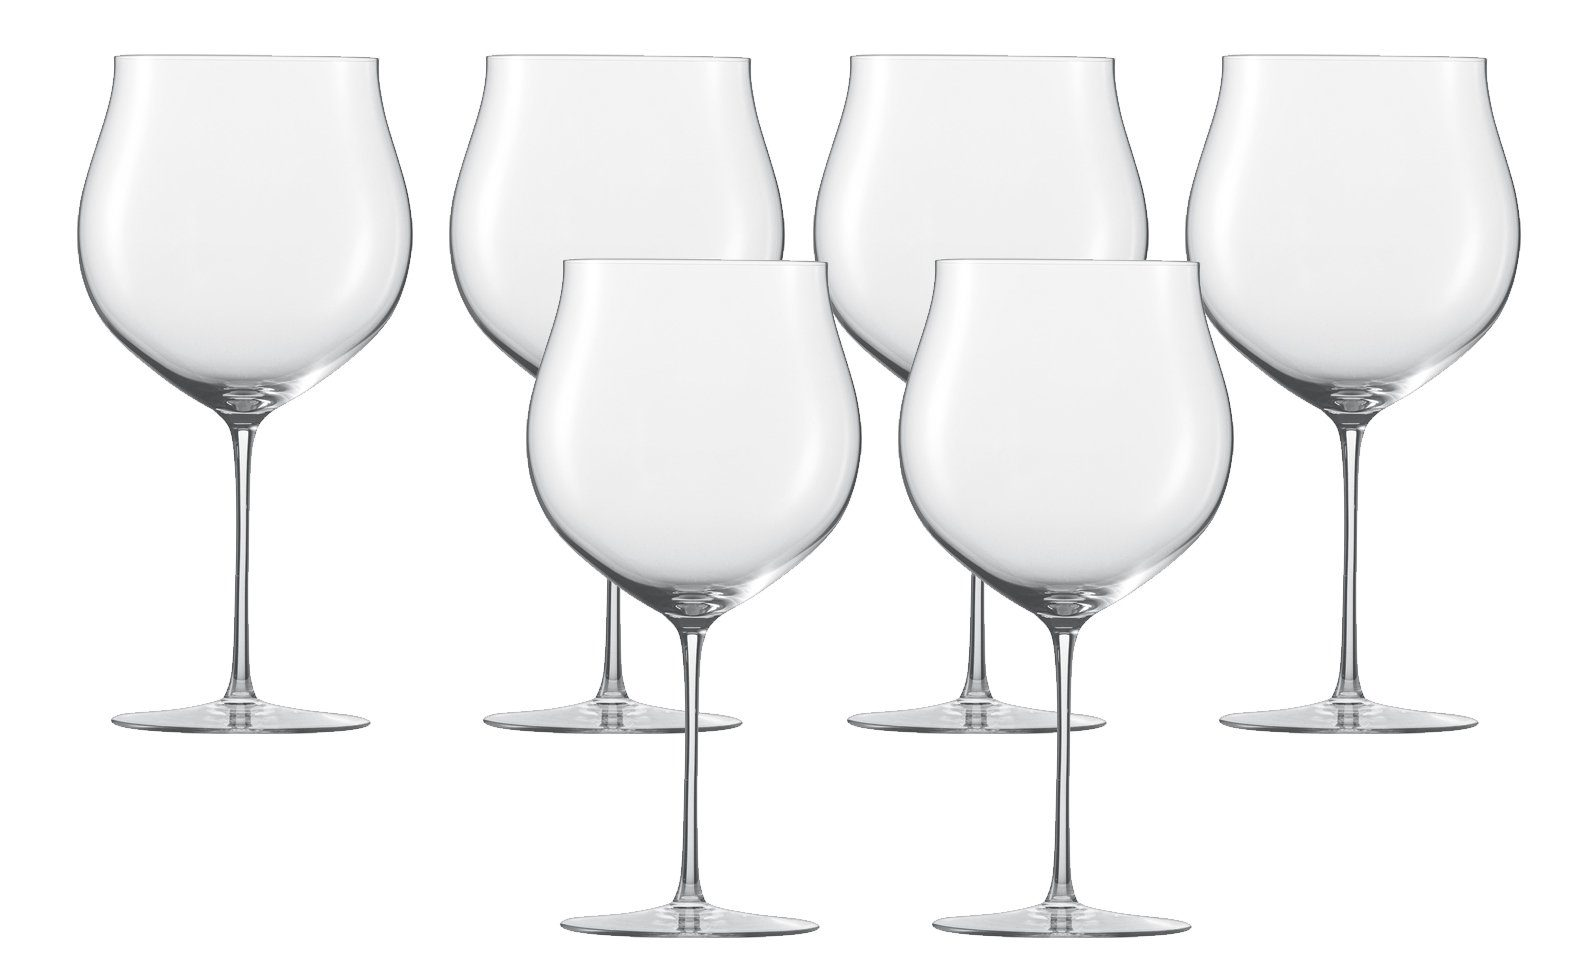 Zwiesel 1872 Bourgogne Grand Cru Glas 6er-Set »Enoteca«